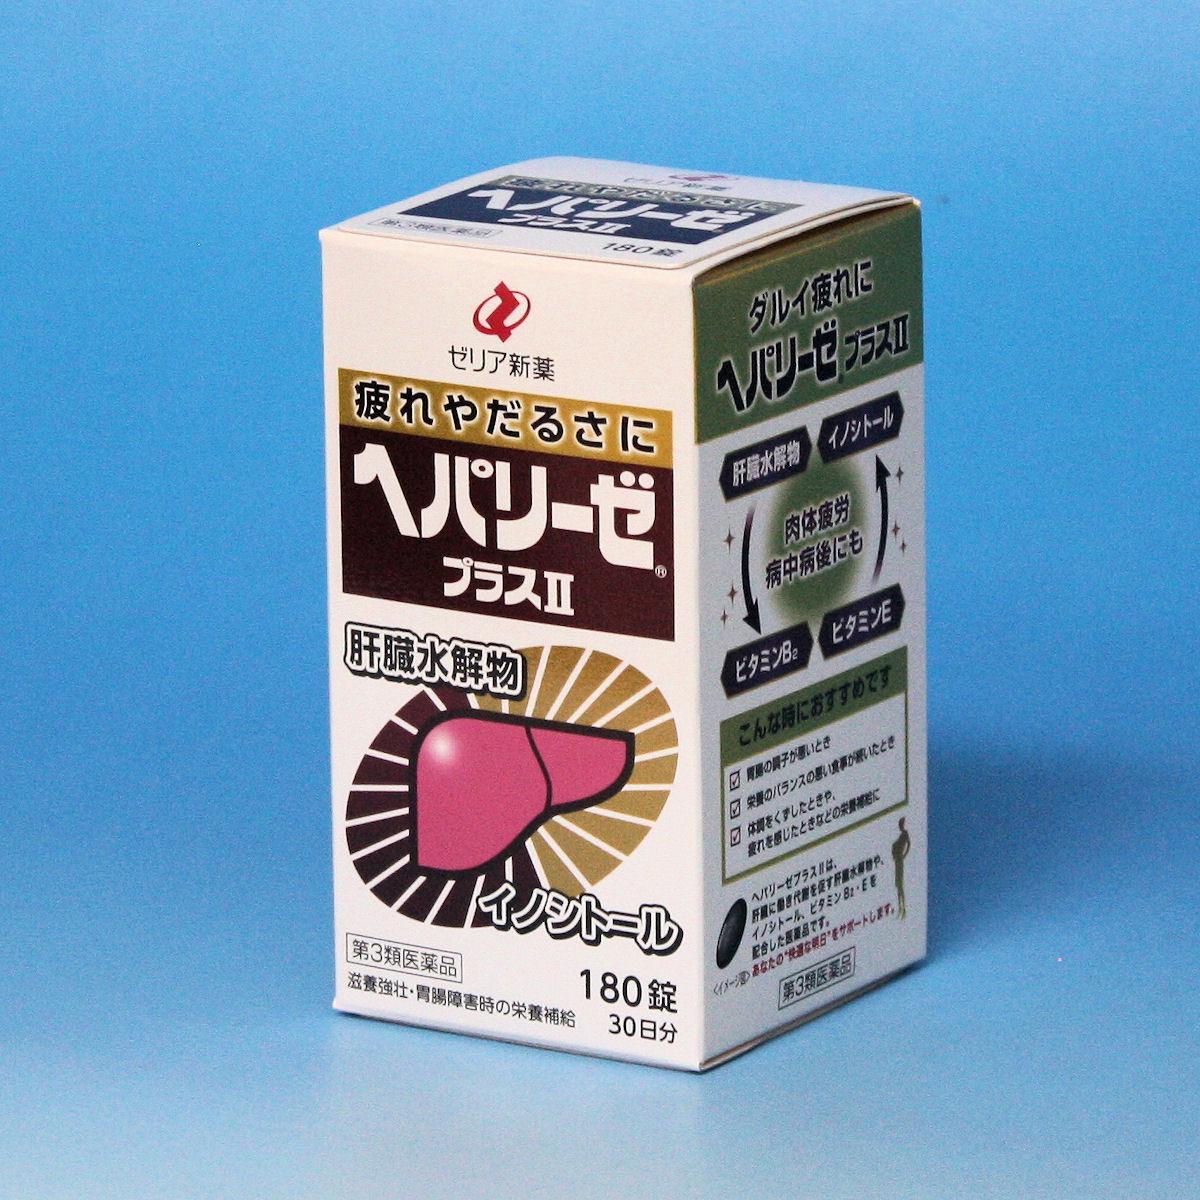 Thuốc Bổ Gan Liver Hydrolysate